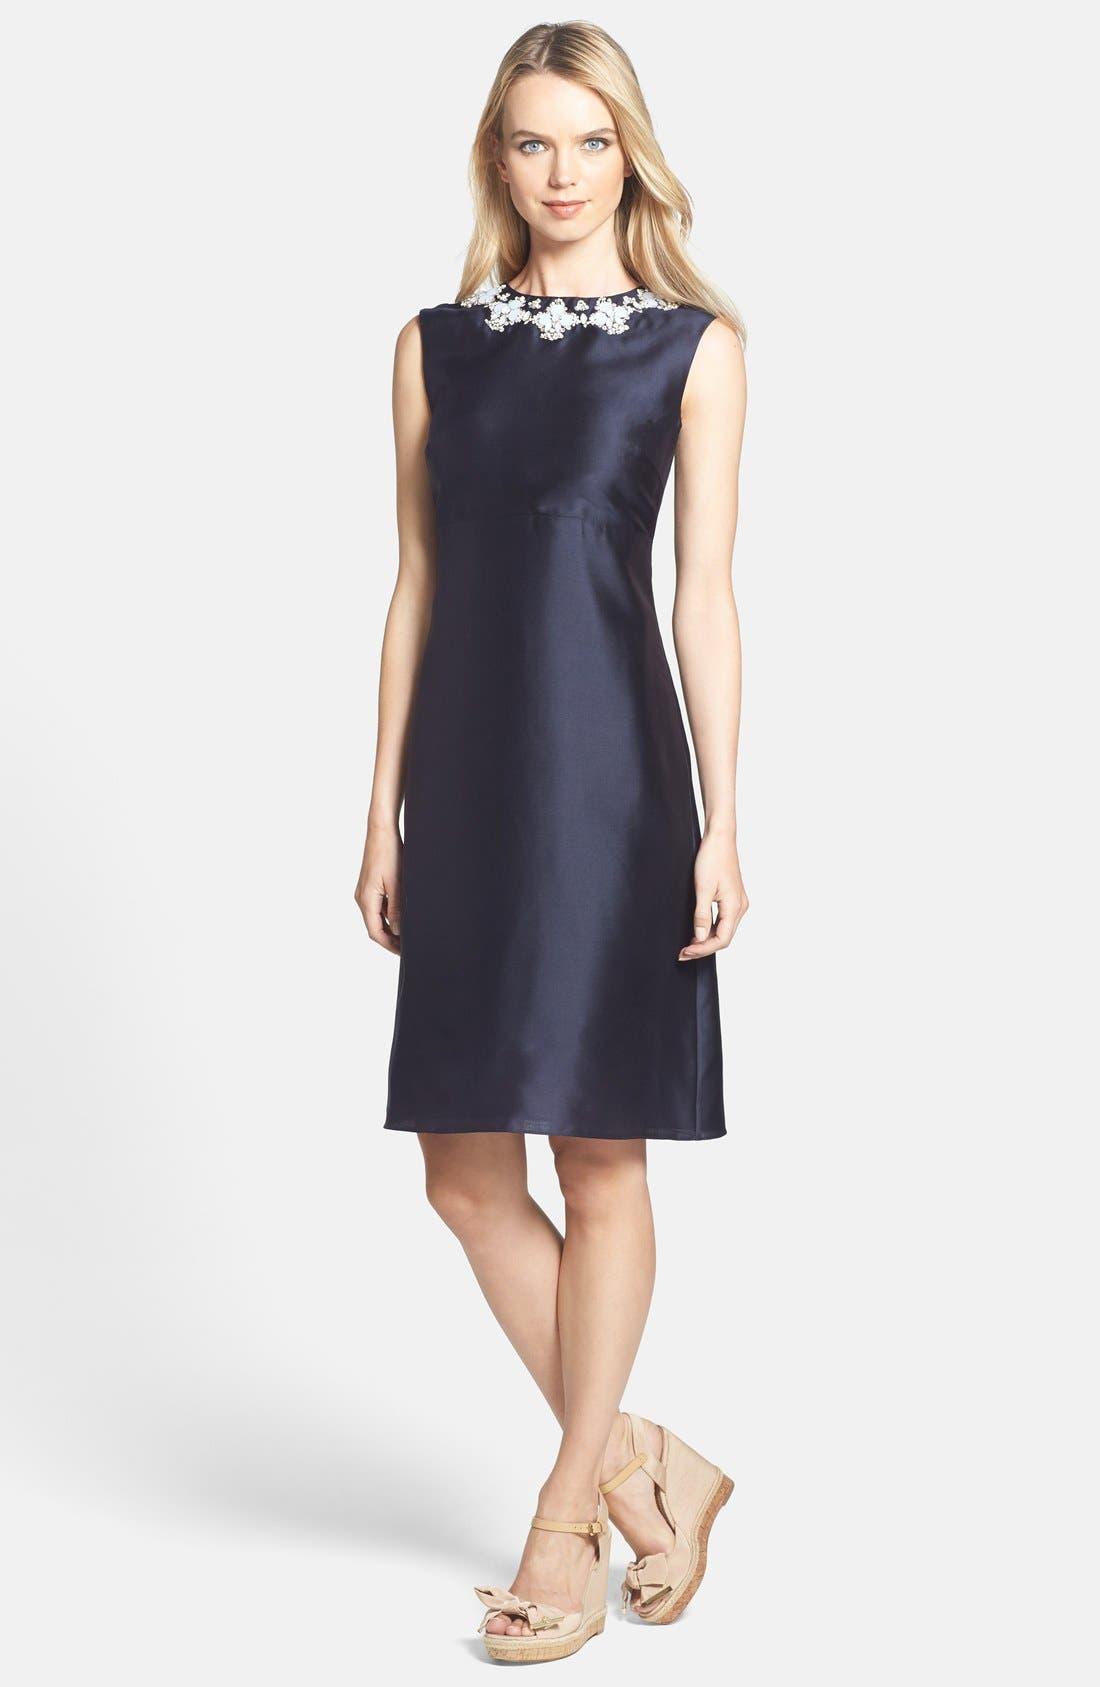 Main Image - Tory Burch 'Colton' Embellished Silk A-Line Dress